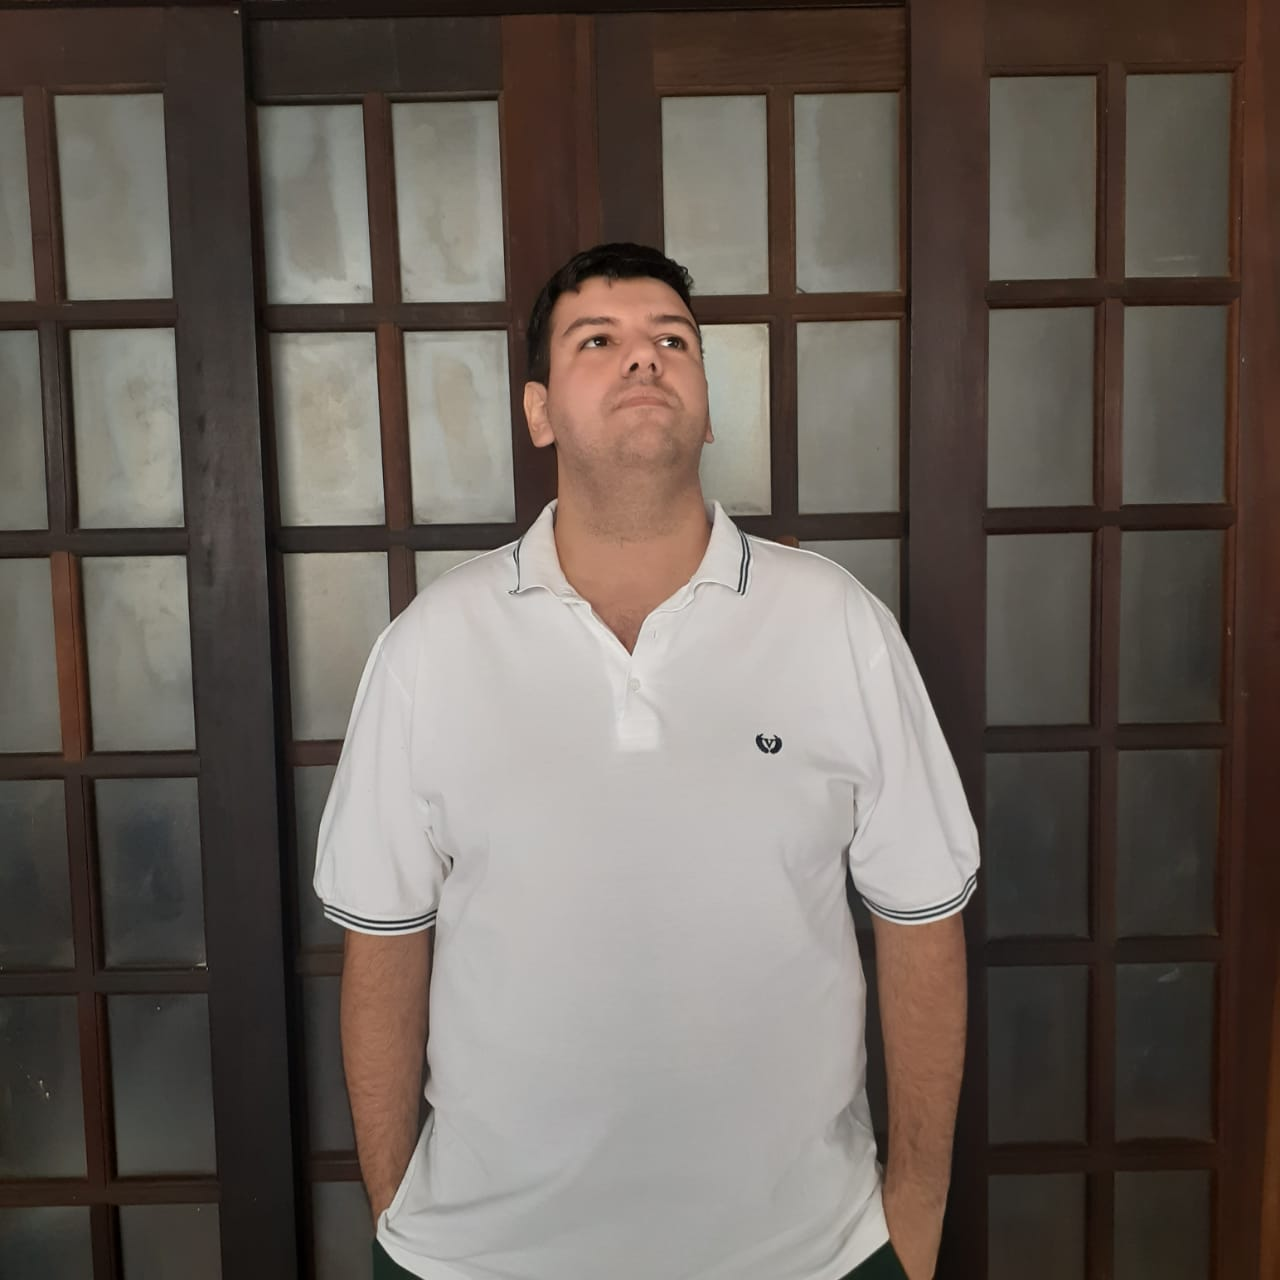 Felipe Depaula